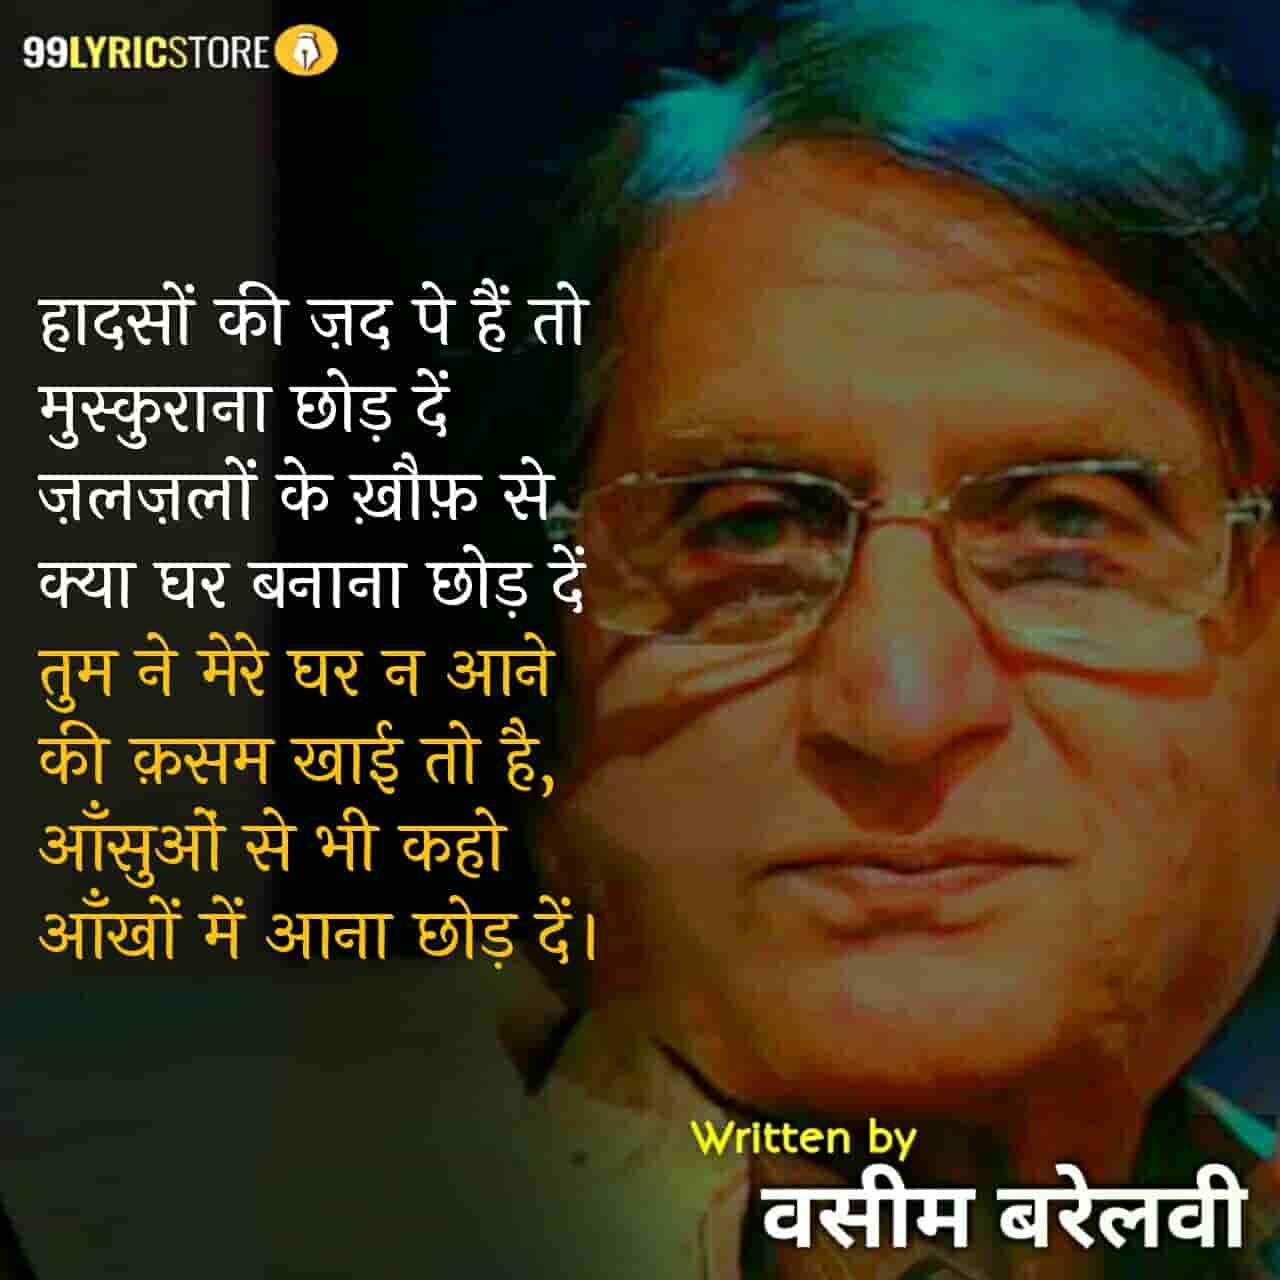 This beautiful Ghazal 'Haadson Ki Zad Pe Hain Toh Muskurana Chhod De' has written by Waseem Barelvi.